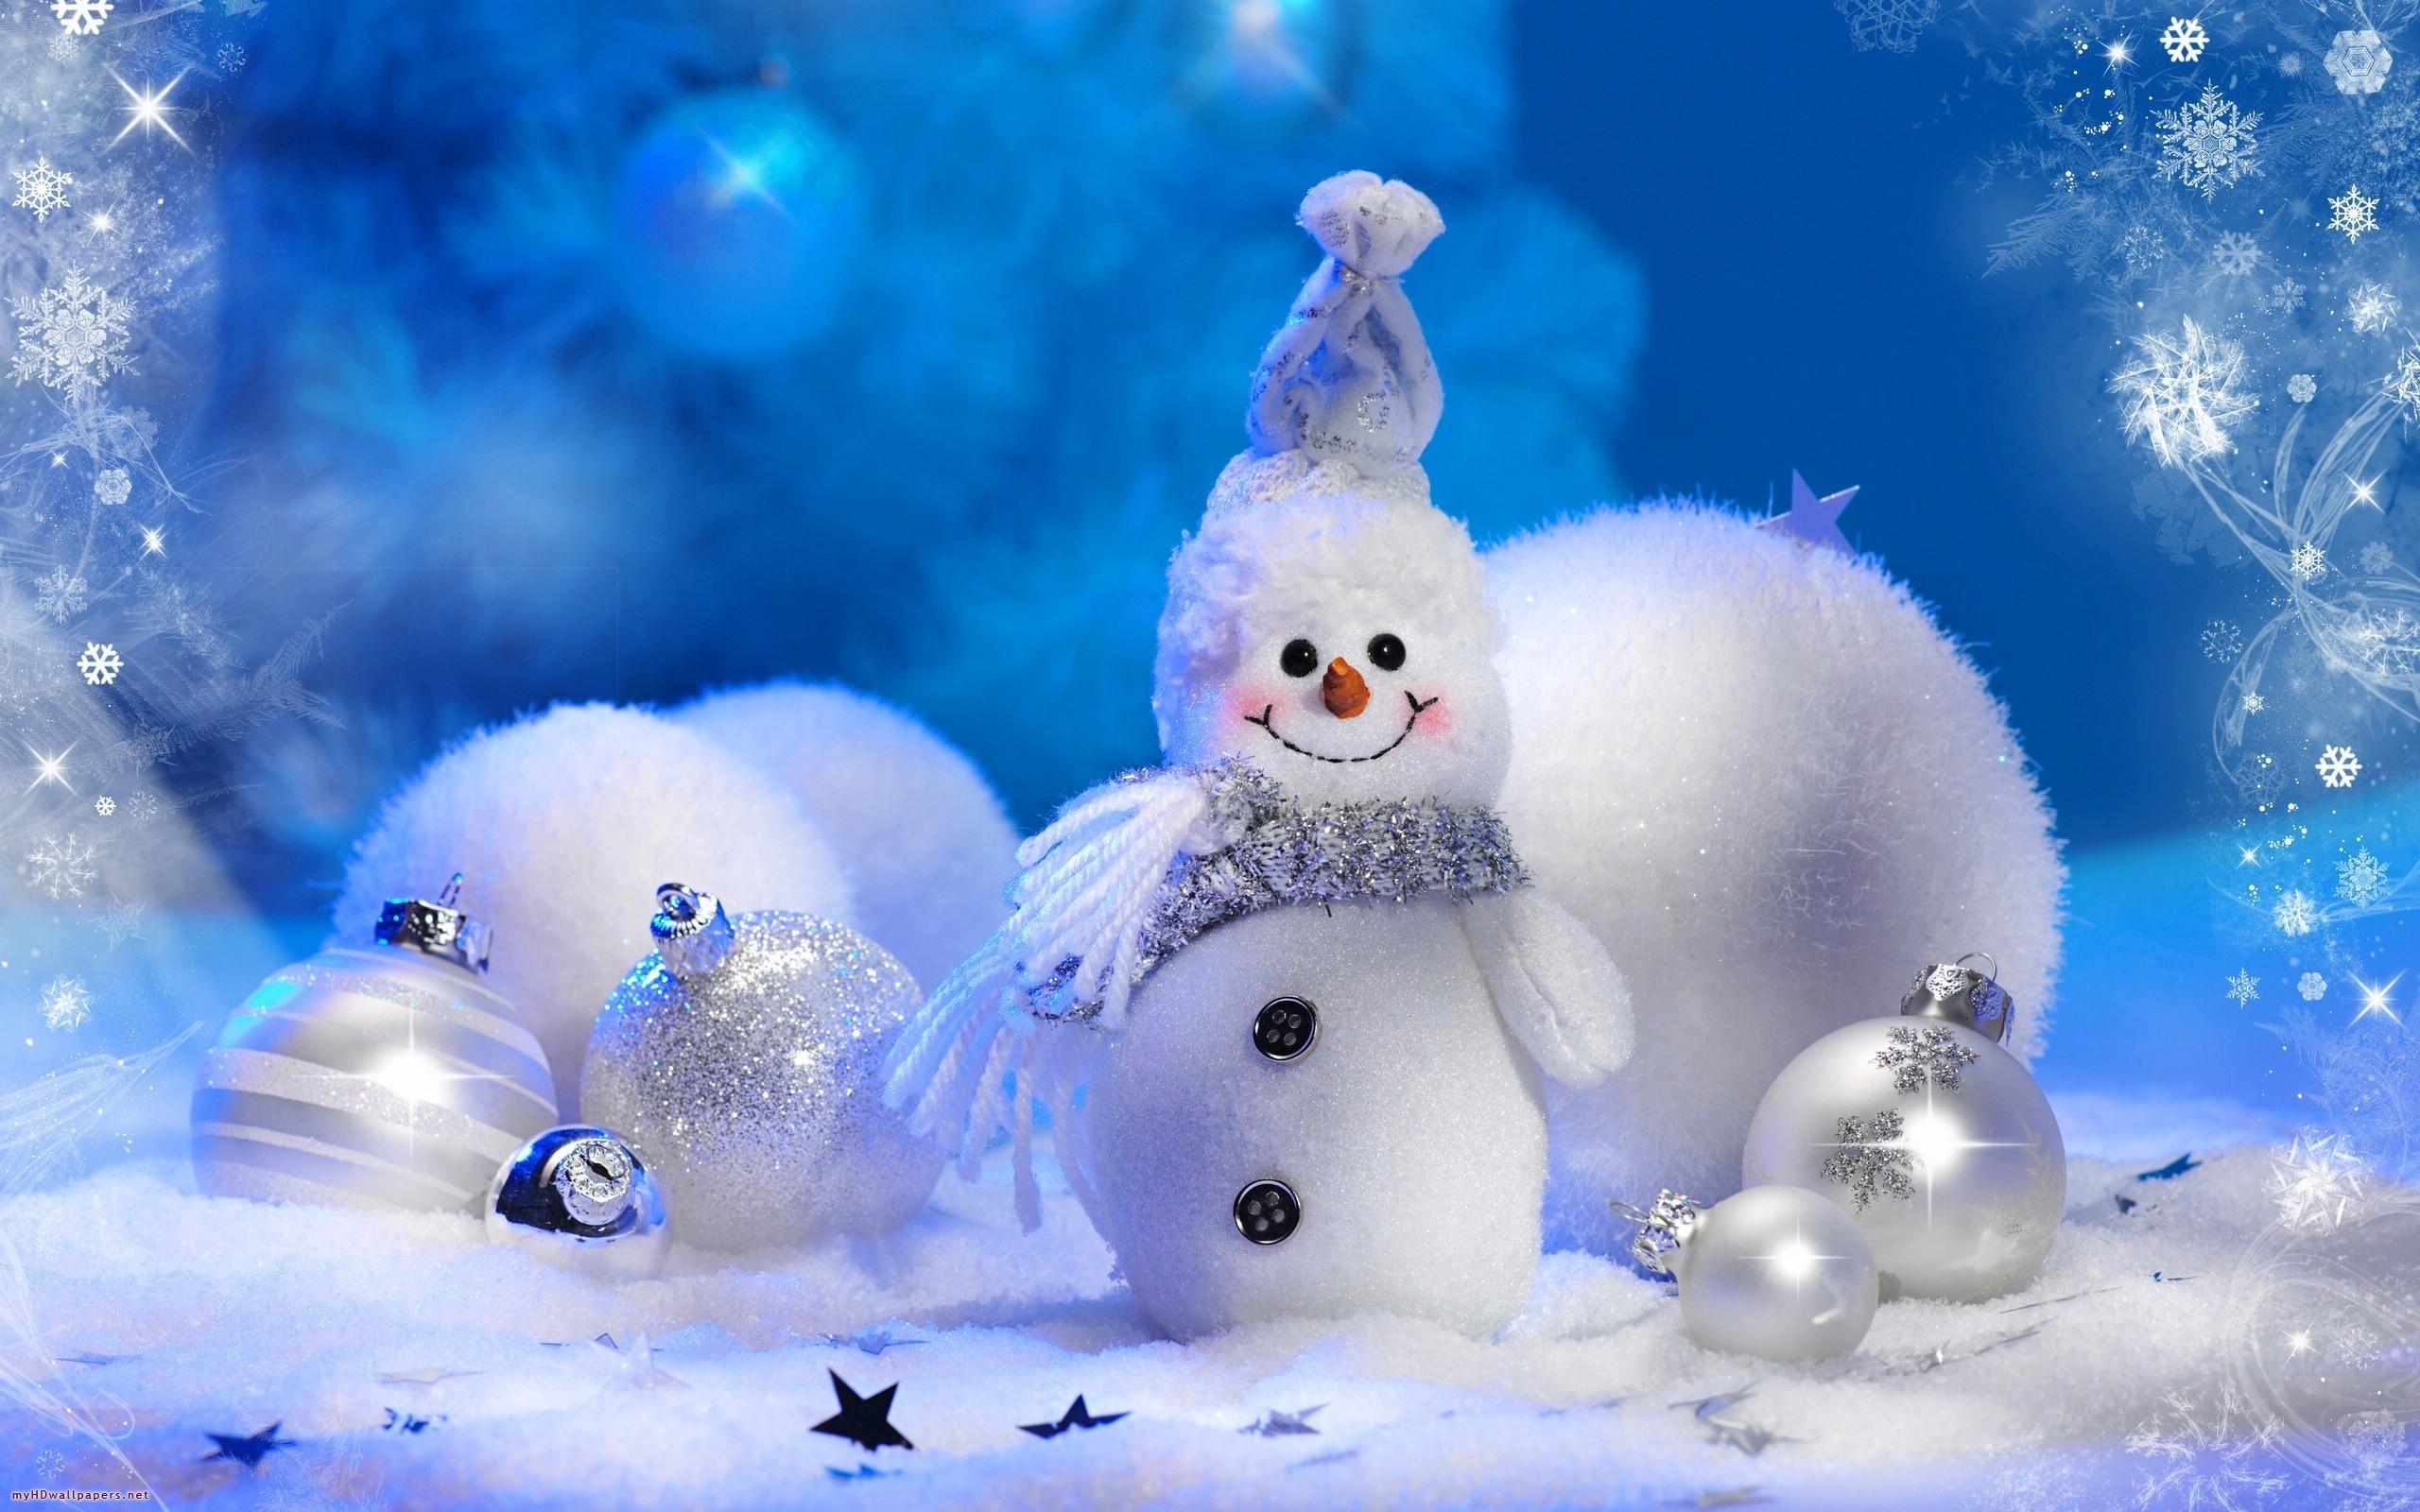 Snowman Desktop Wallpaper 59 images 2560x1600